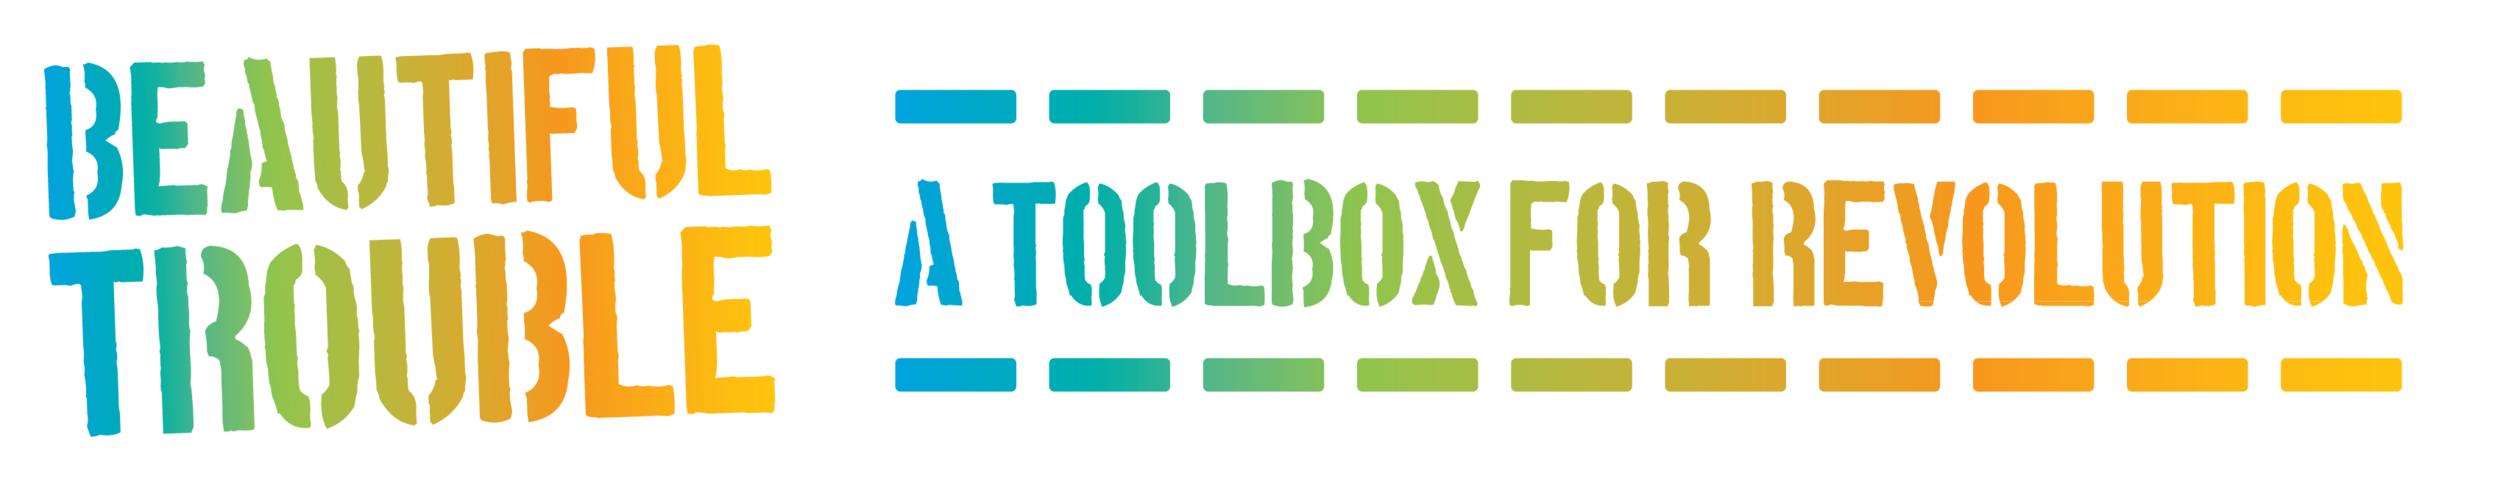 BT_Toolbox for Revolution.png